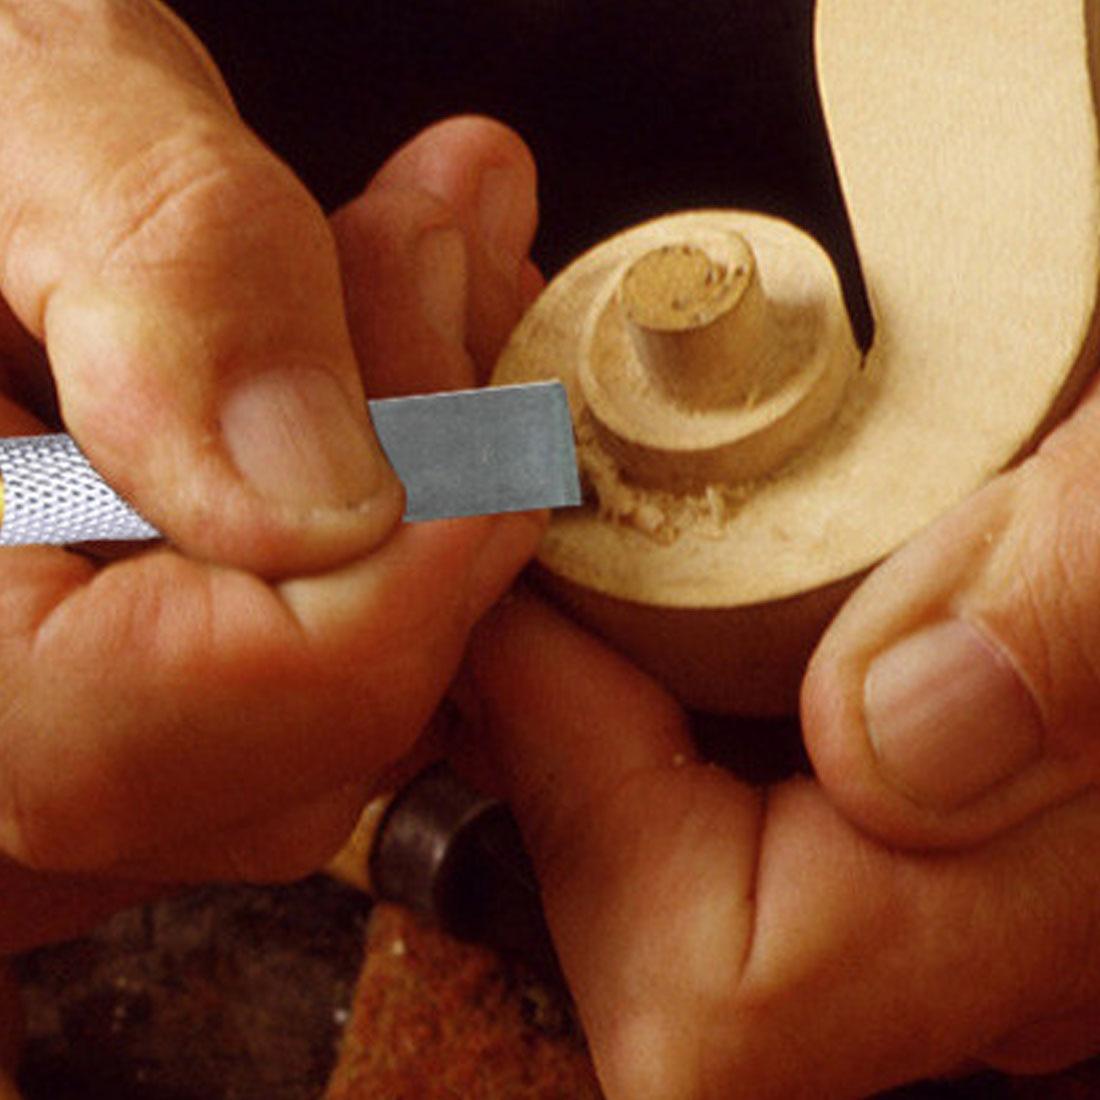 9pcs/set Blades Wood Carving Tools Fruit Food Craft Sculpture Engraving Knife Scalpel DIY Cutting Tool Repair Hand Tool Sets 4